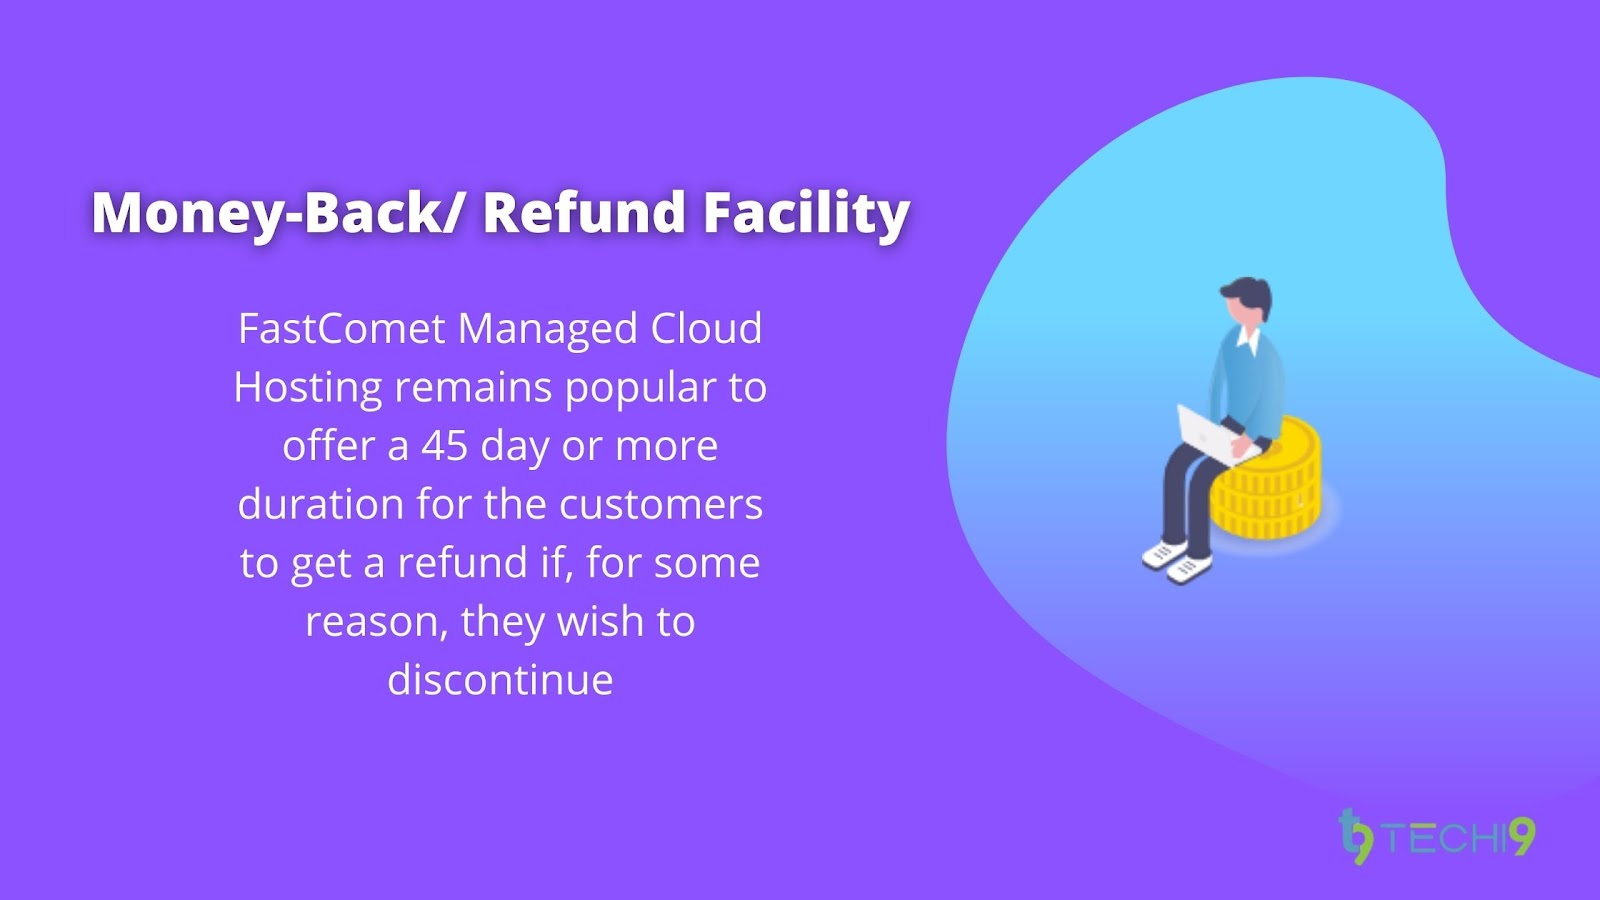 FastComet Money-Back/ Refund Facility